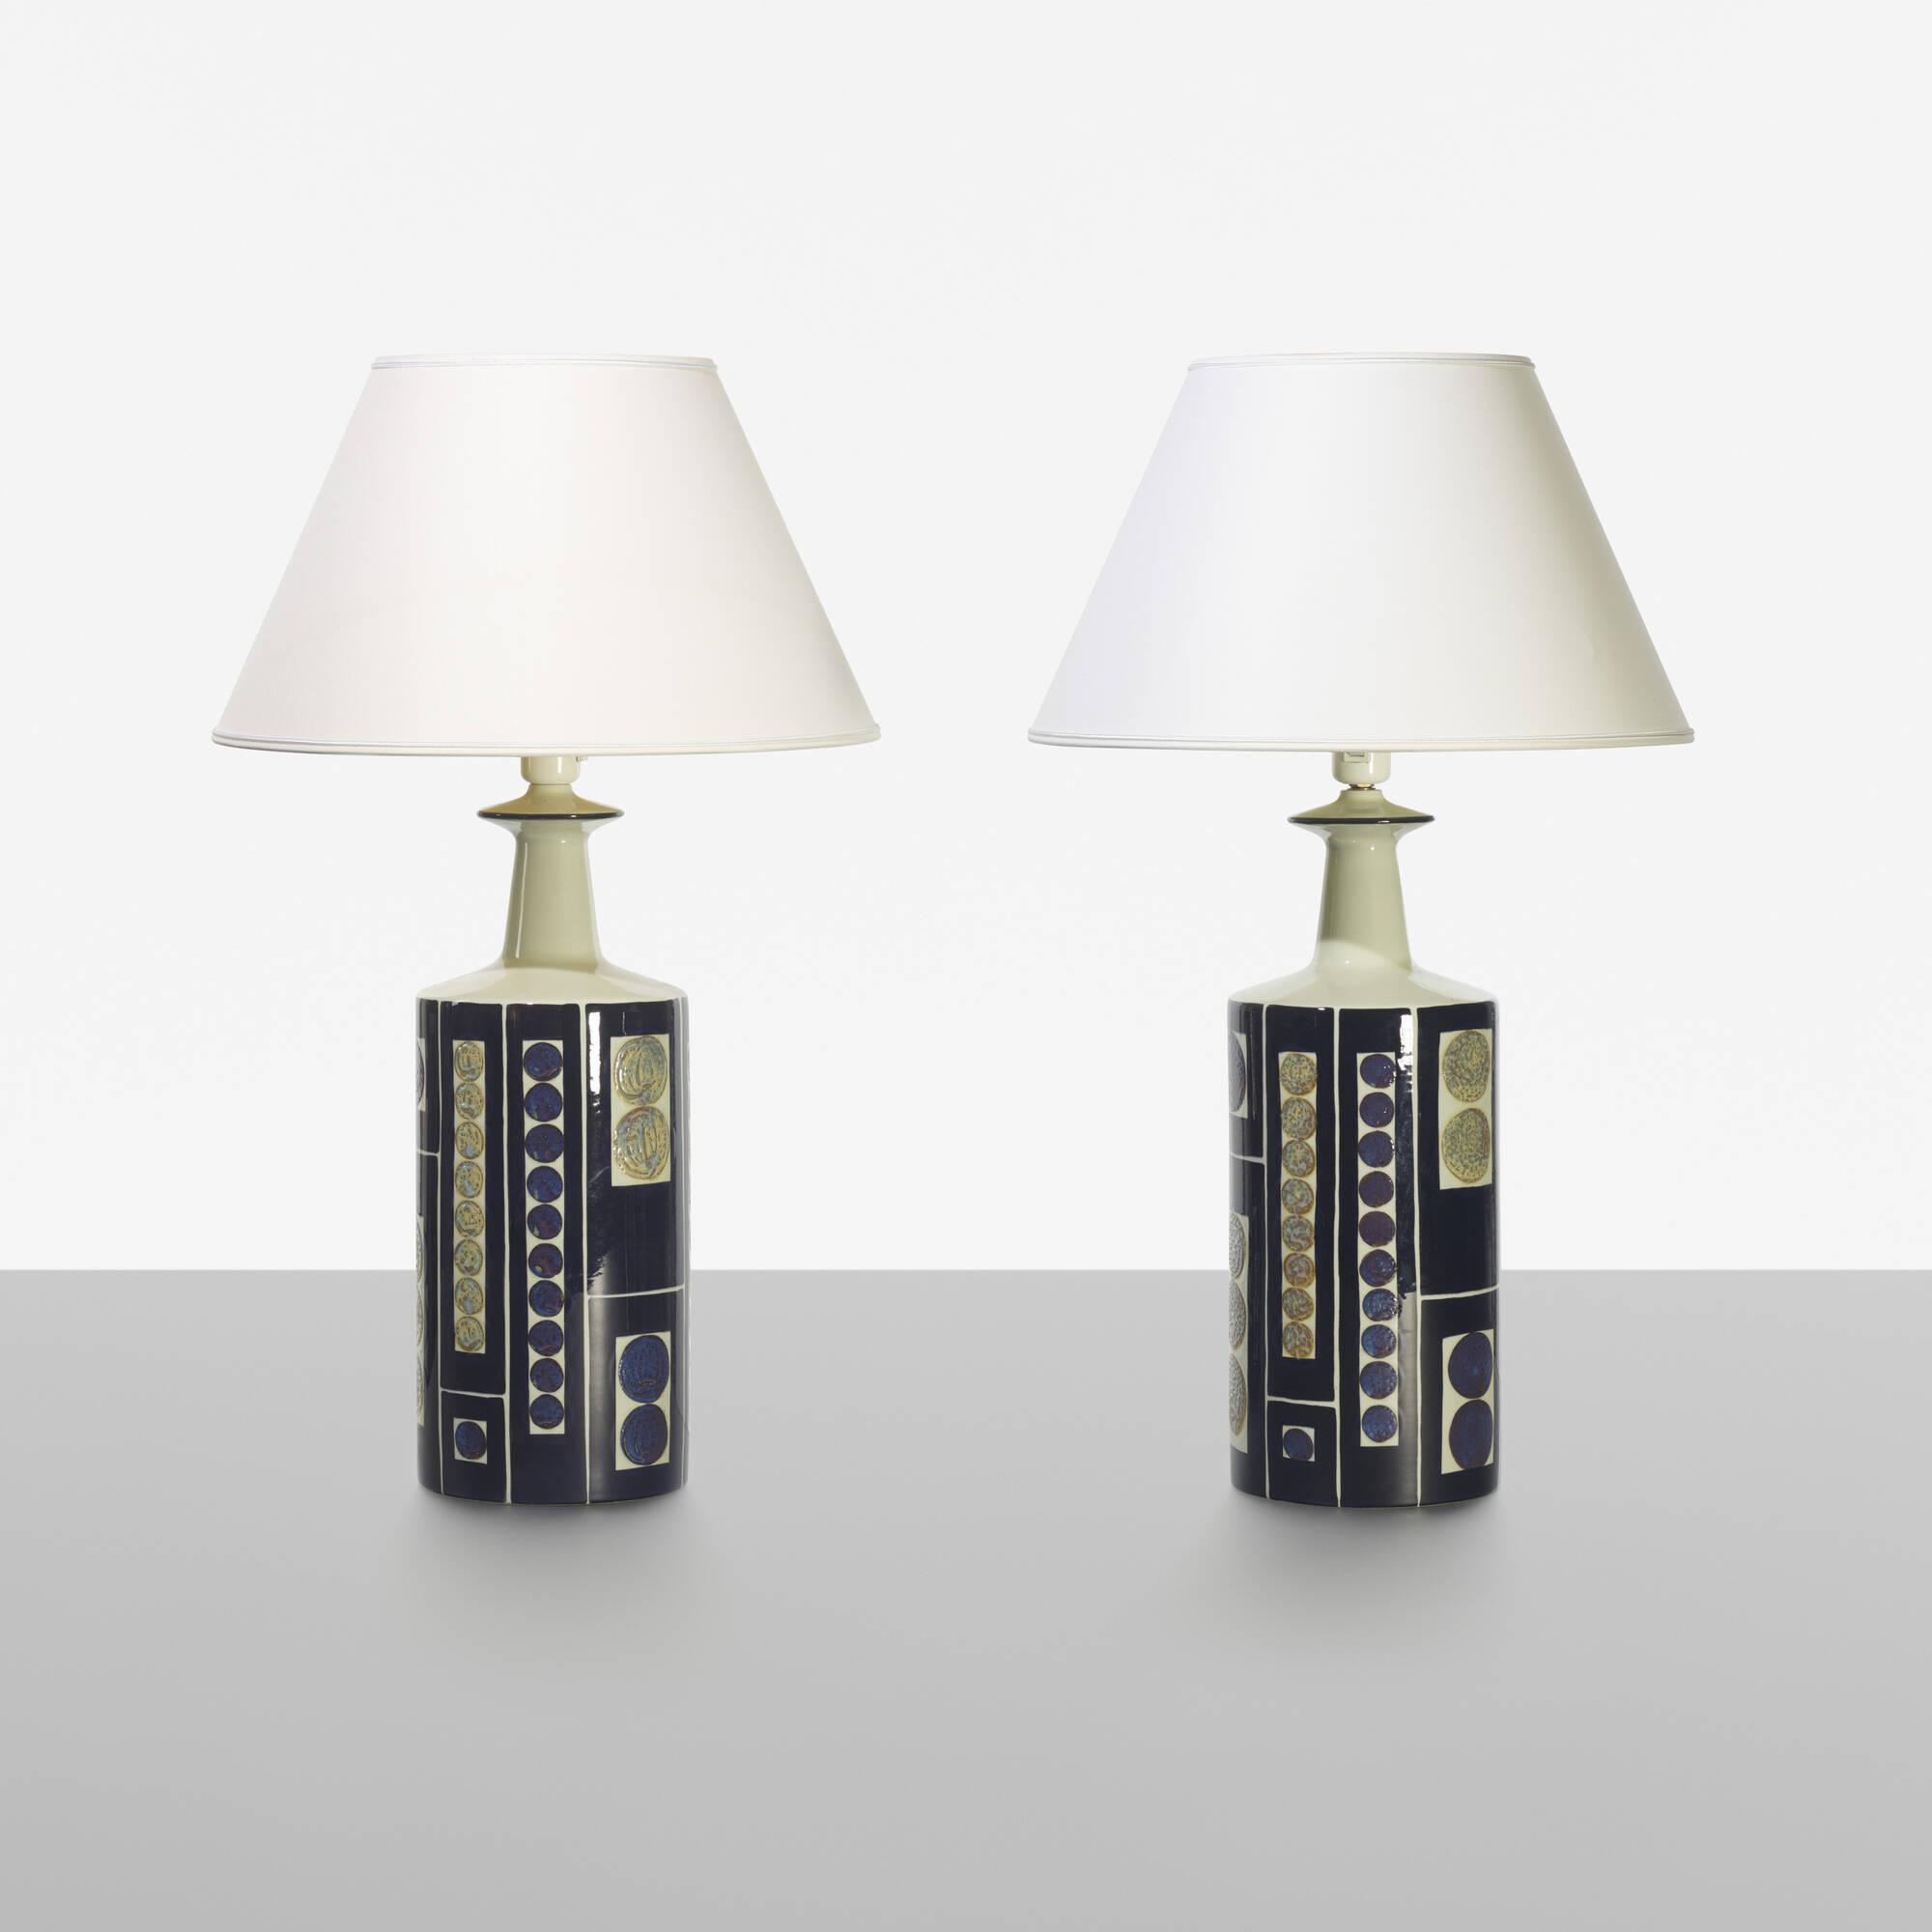 202: Royal Copenhagen / table lamps, pair (1 of 4)